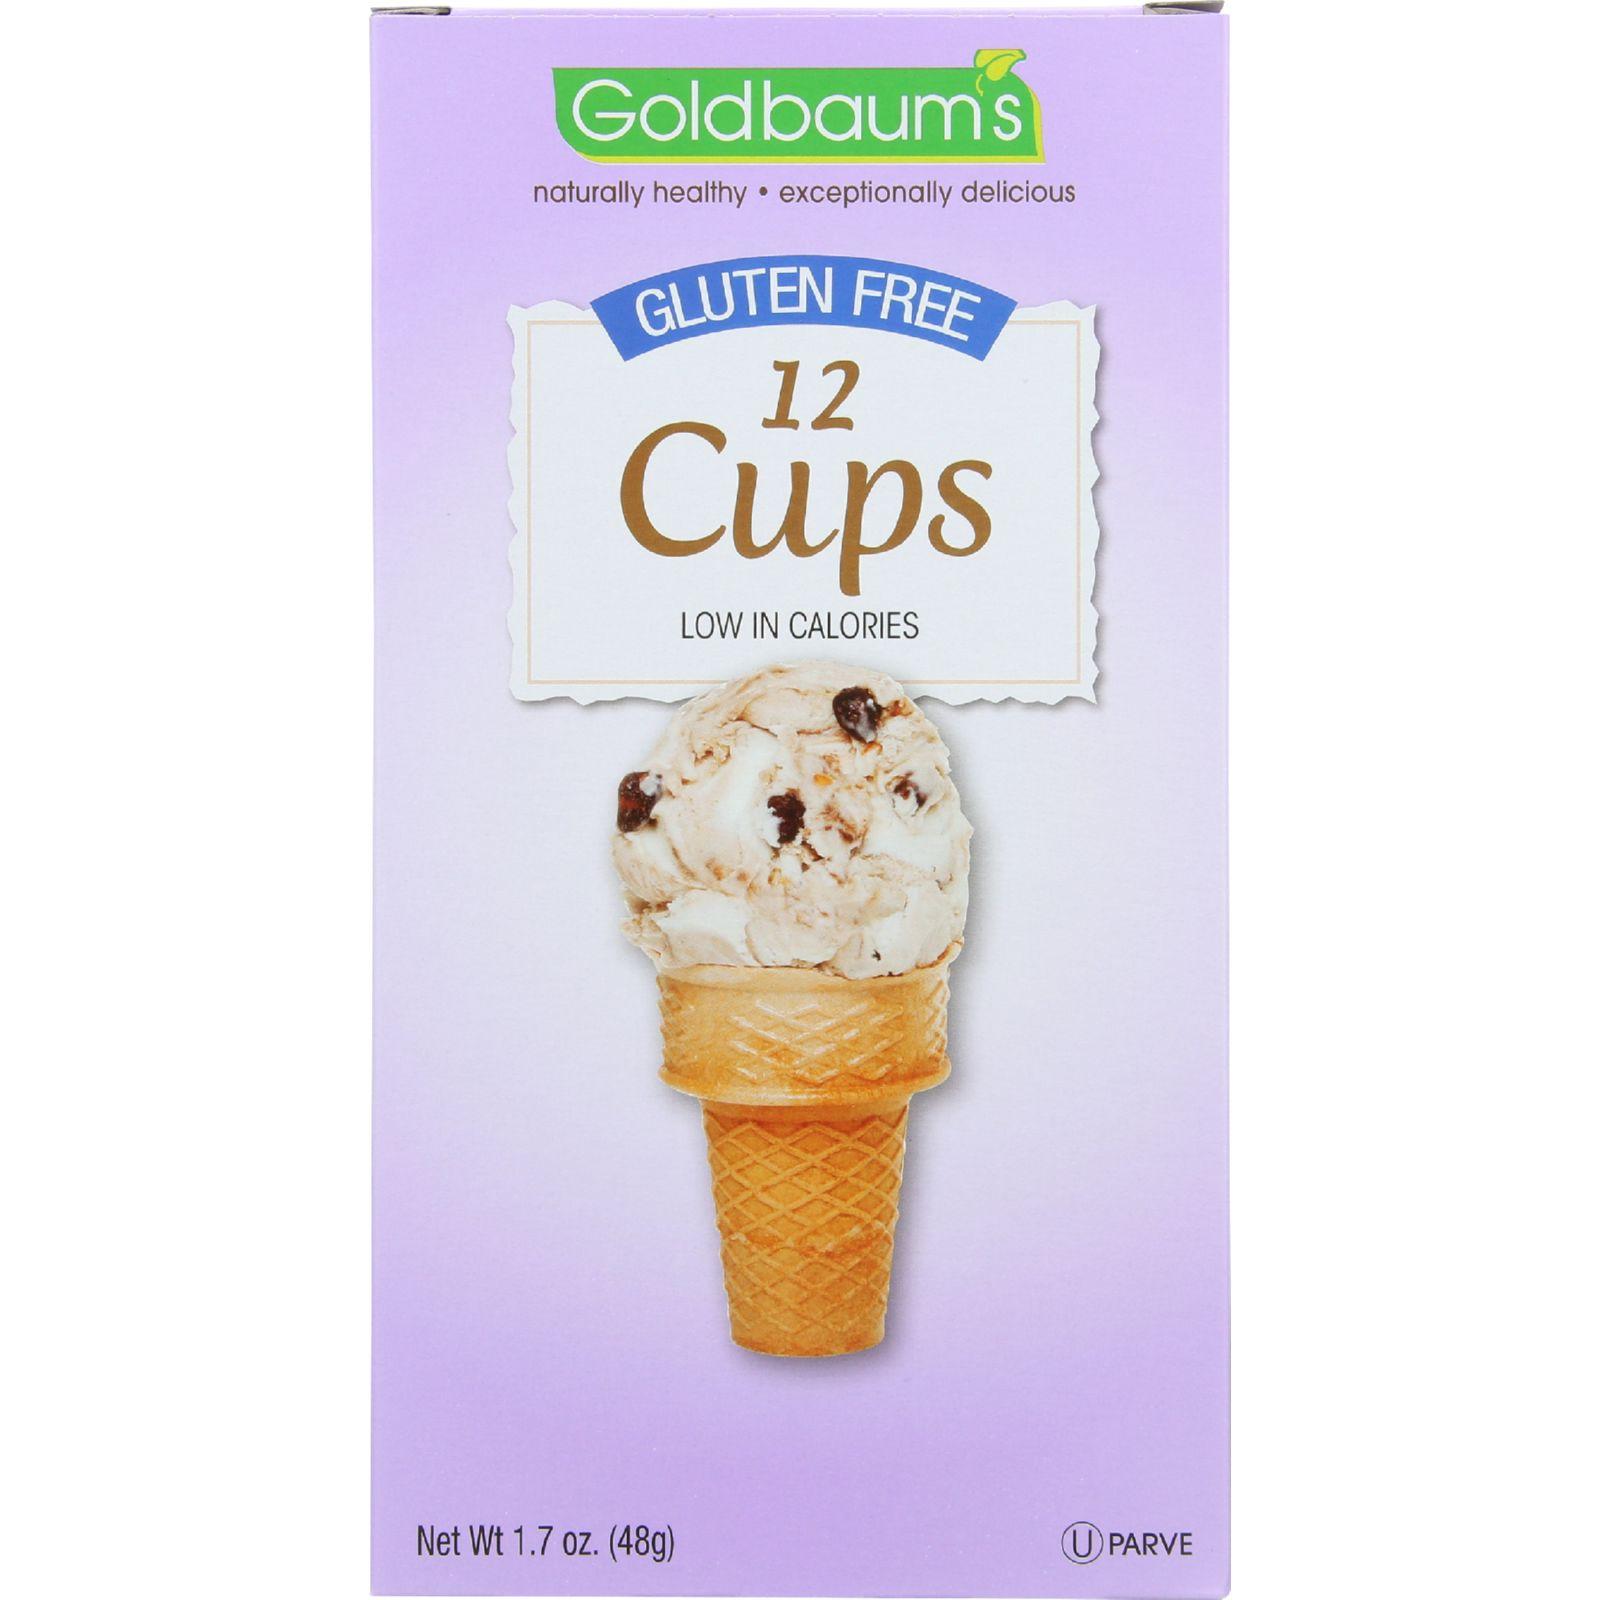 Goldbaums Ice Cream Cone - Cups - Gluten Free - 1.7 Oz - Case Of 12